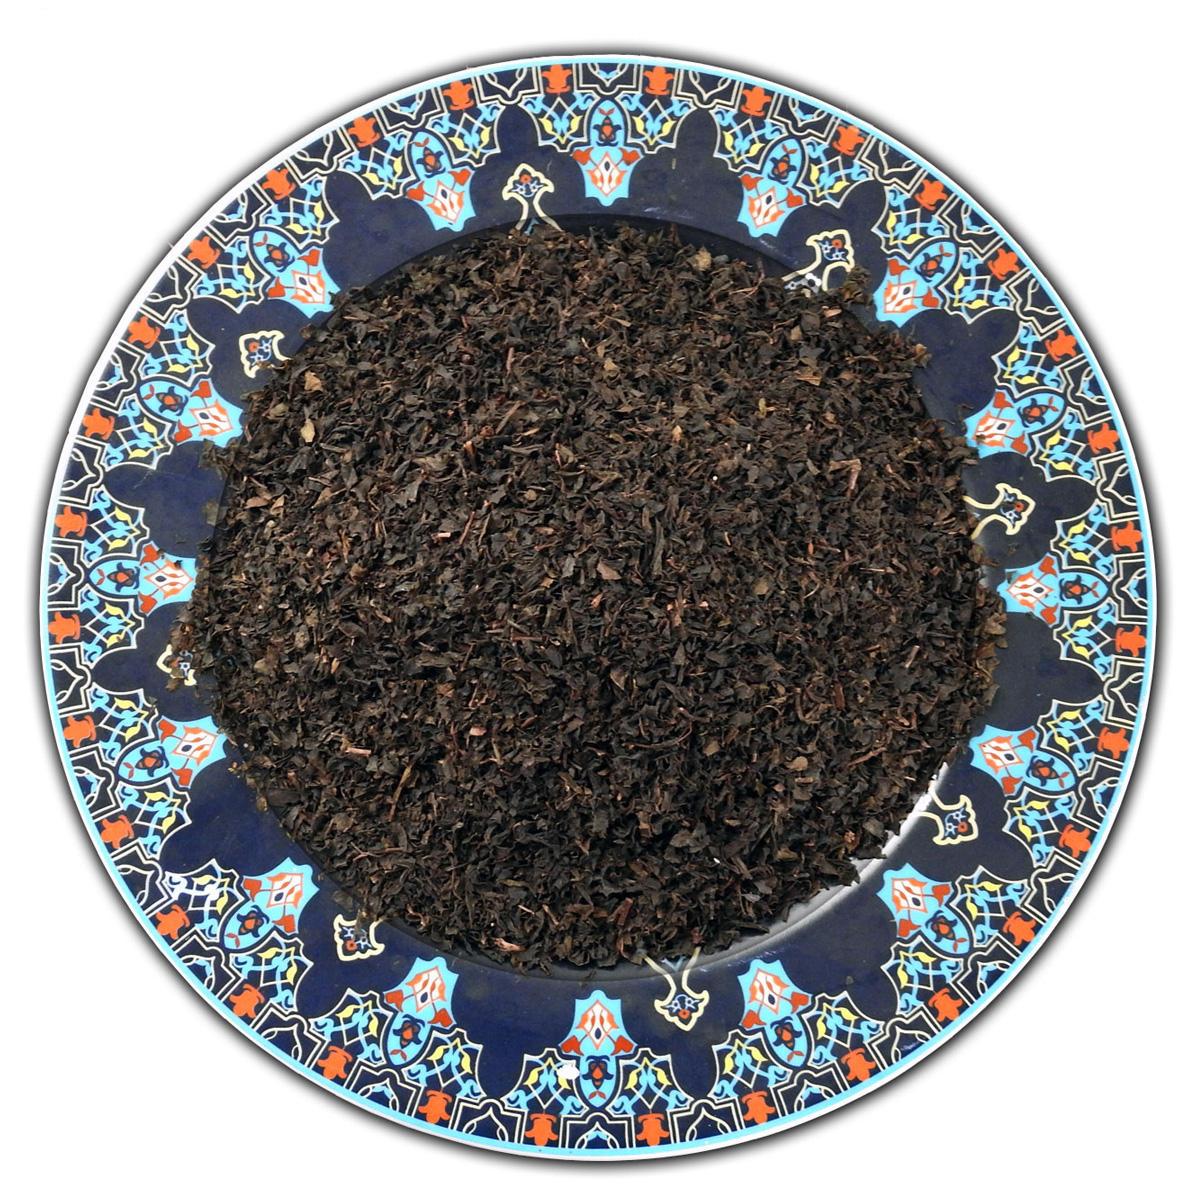 خرید چای سرگل 1400 لاهیجان